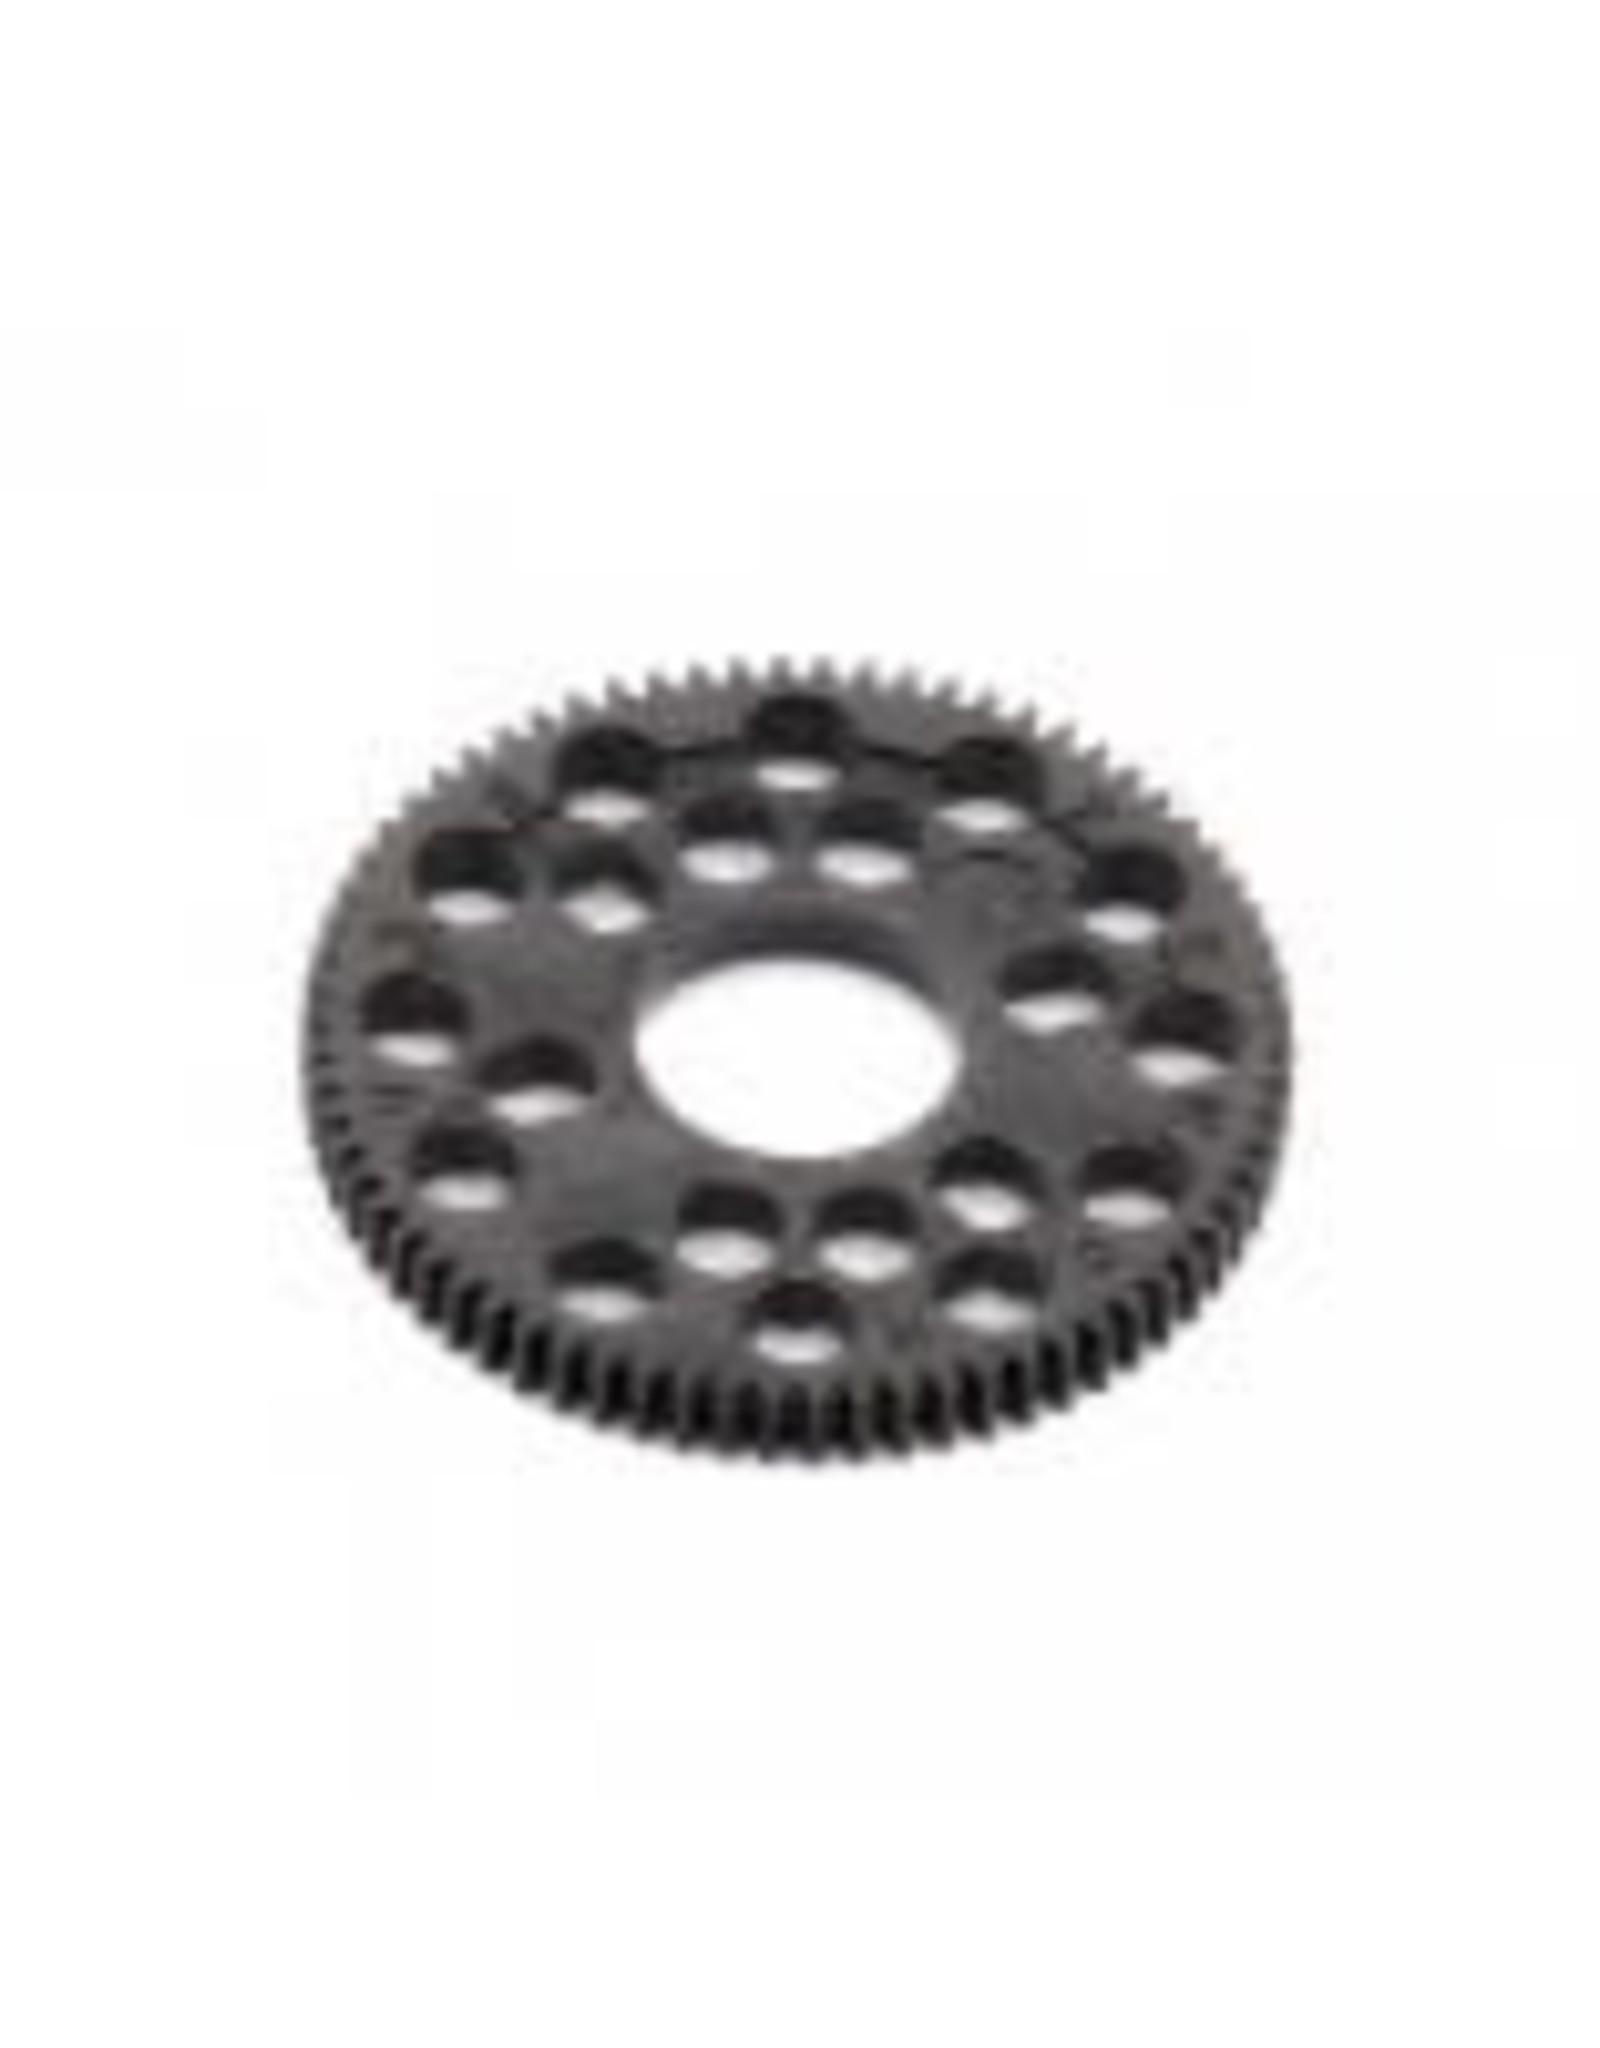 Roche DD 64 Pitch 72T Spur Gear, Black